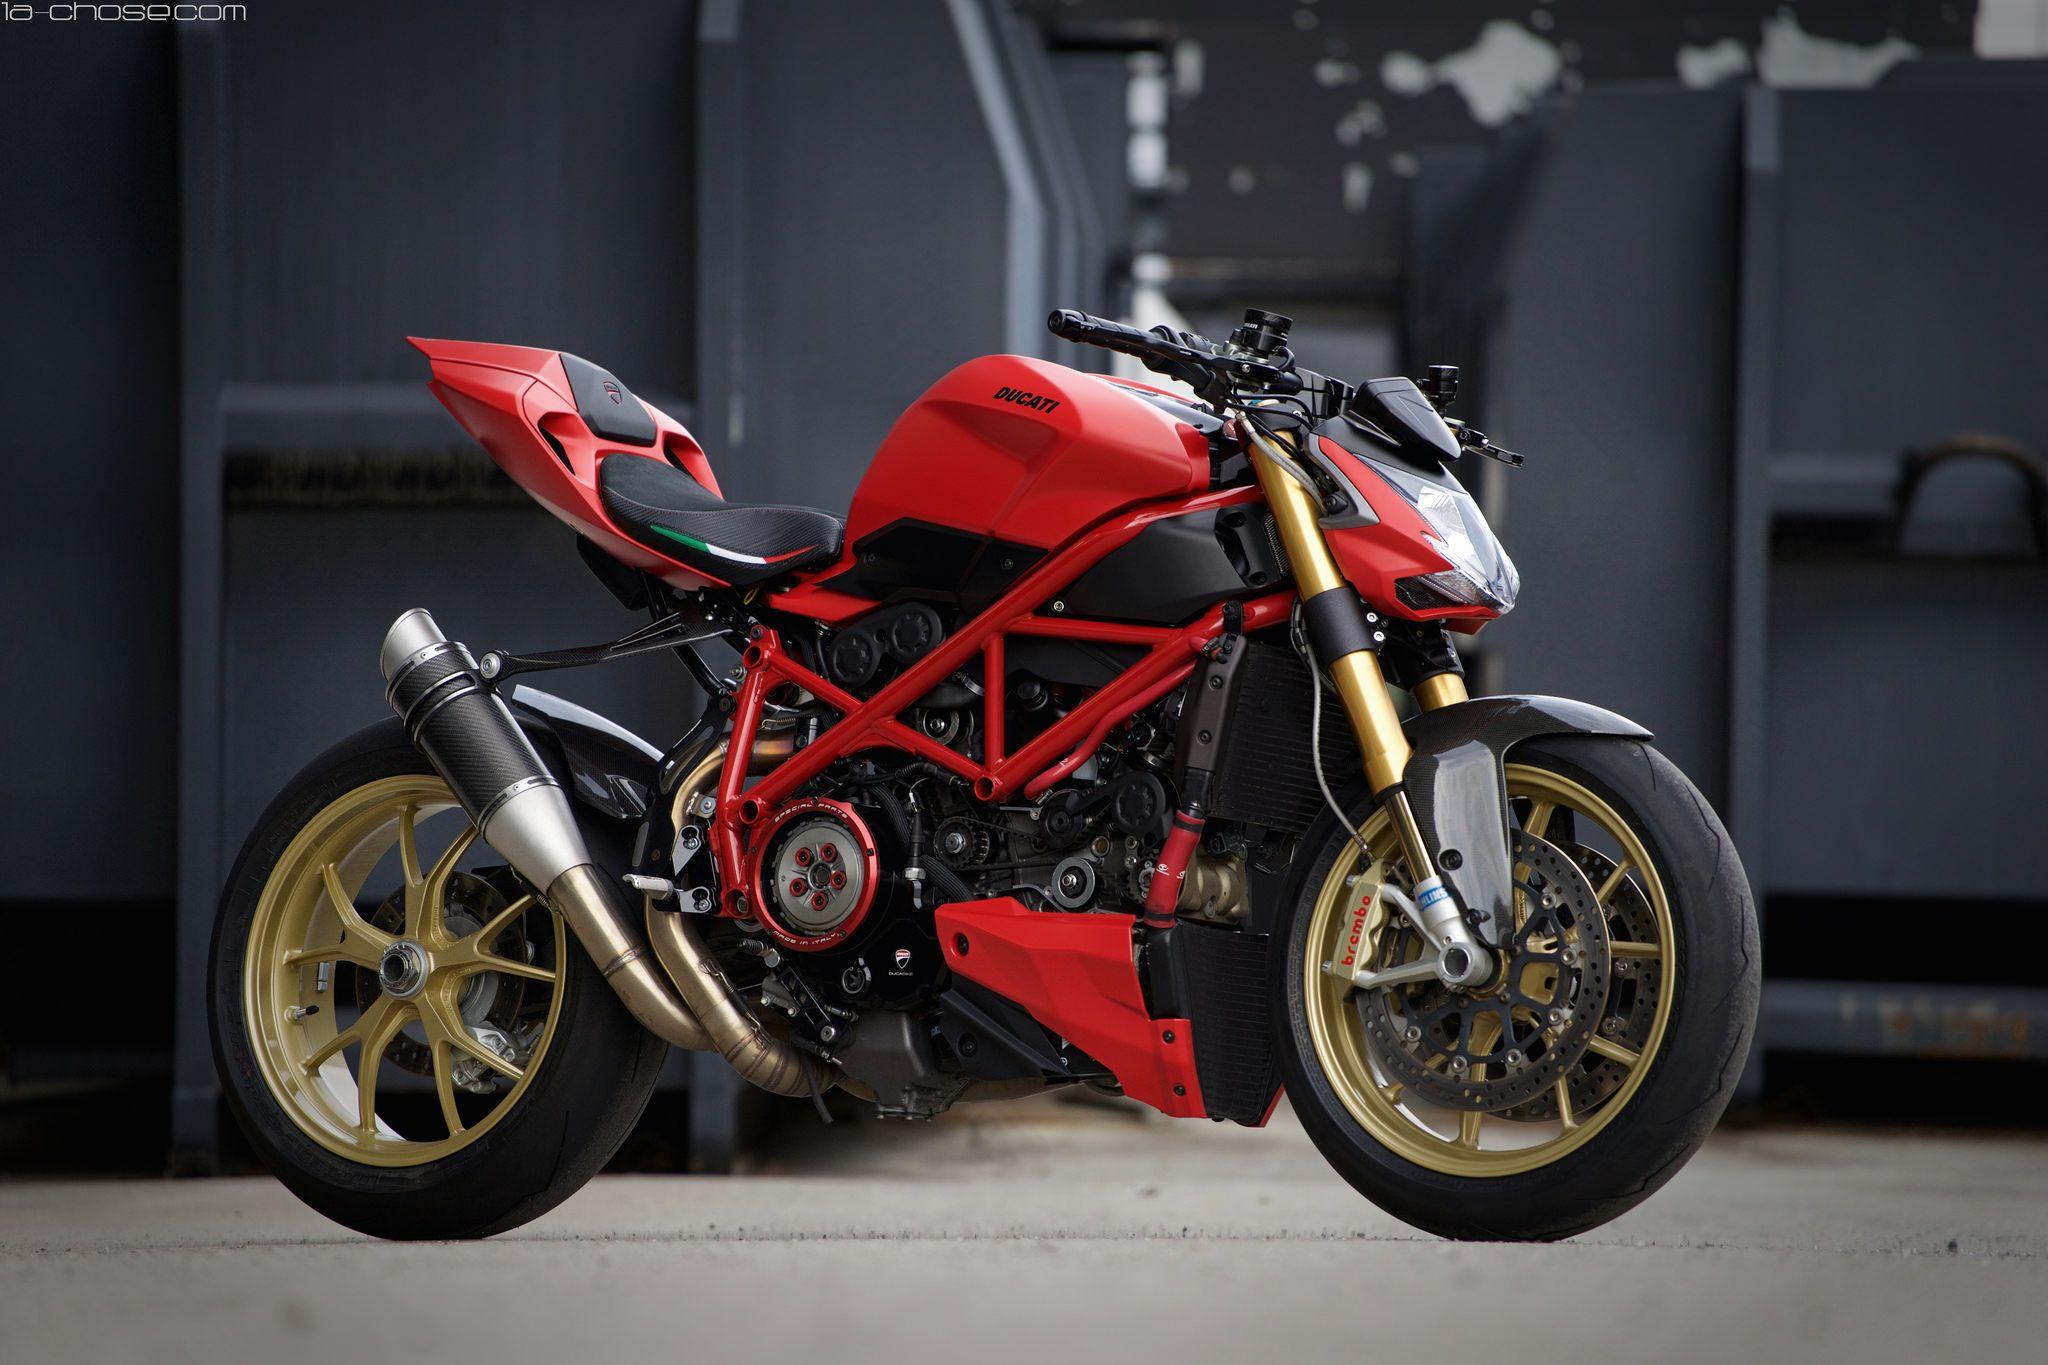 Ducati Streetfighter 848 Ducati Ducati Hypermotard Motorcycle Bike